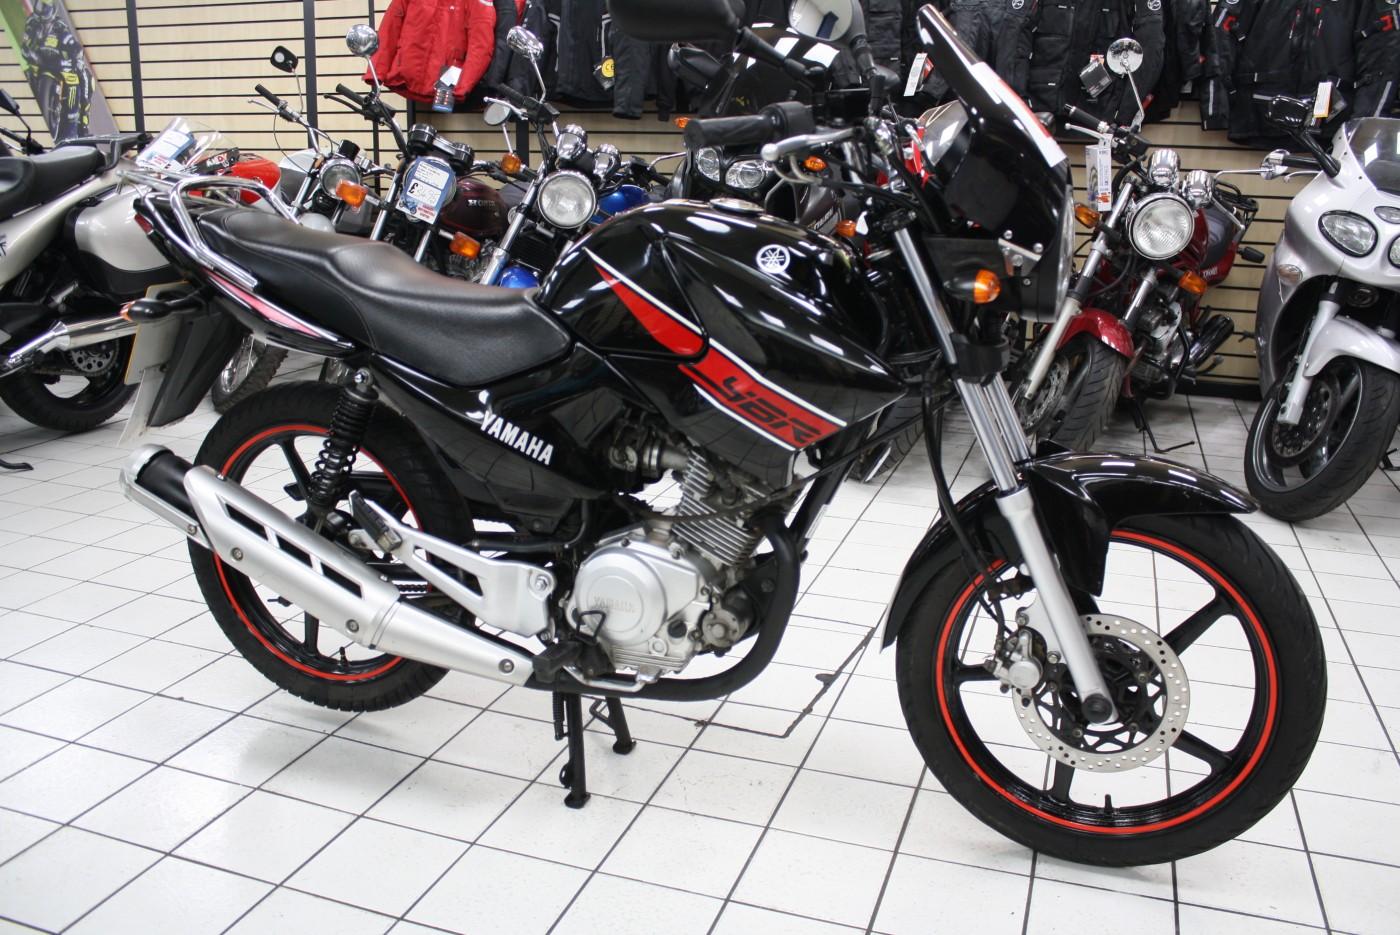 2013 Yamaha YBR 125 CC black